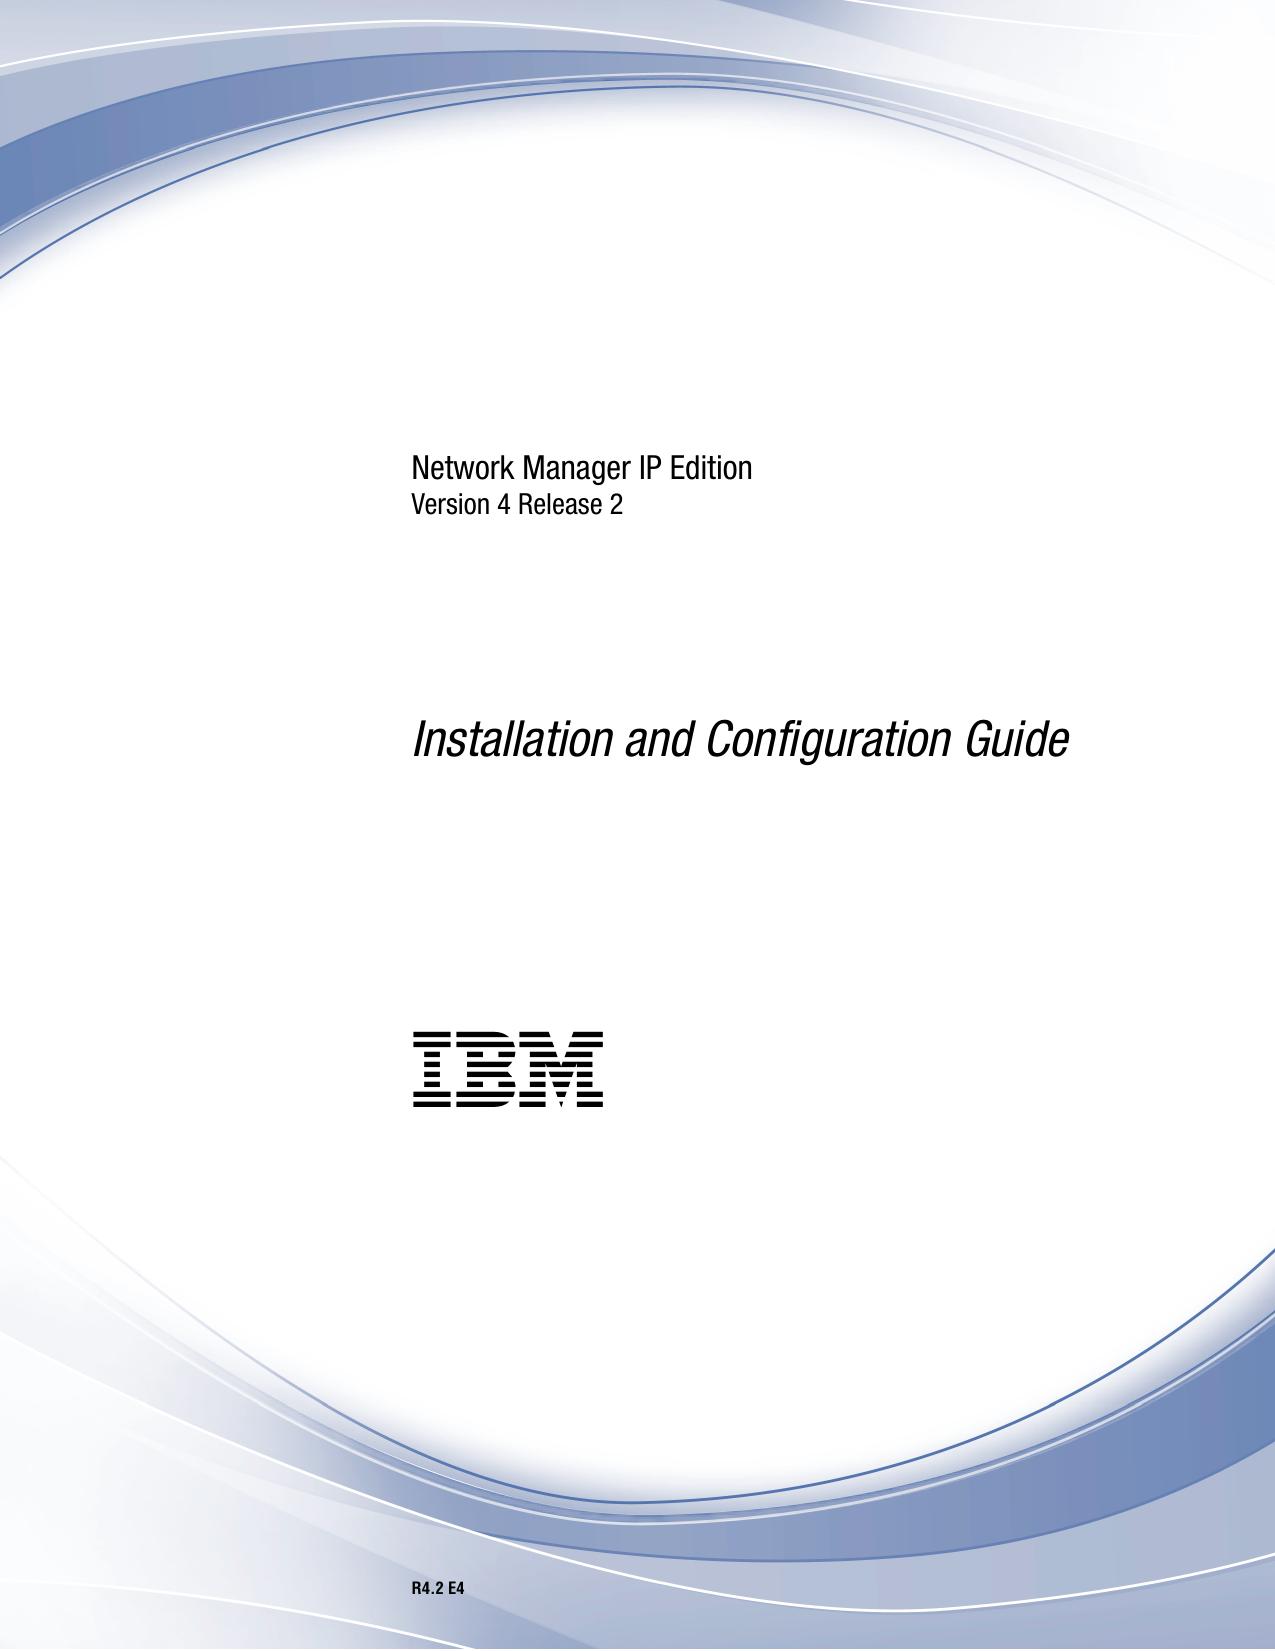 IBM Tivoli Network Manager IP Edition: Installation and | manualzz com